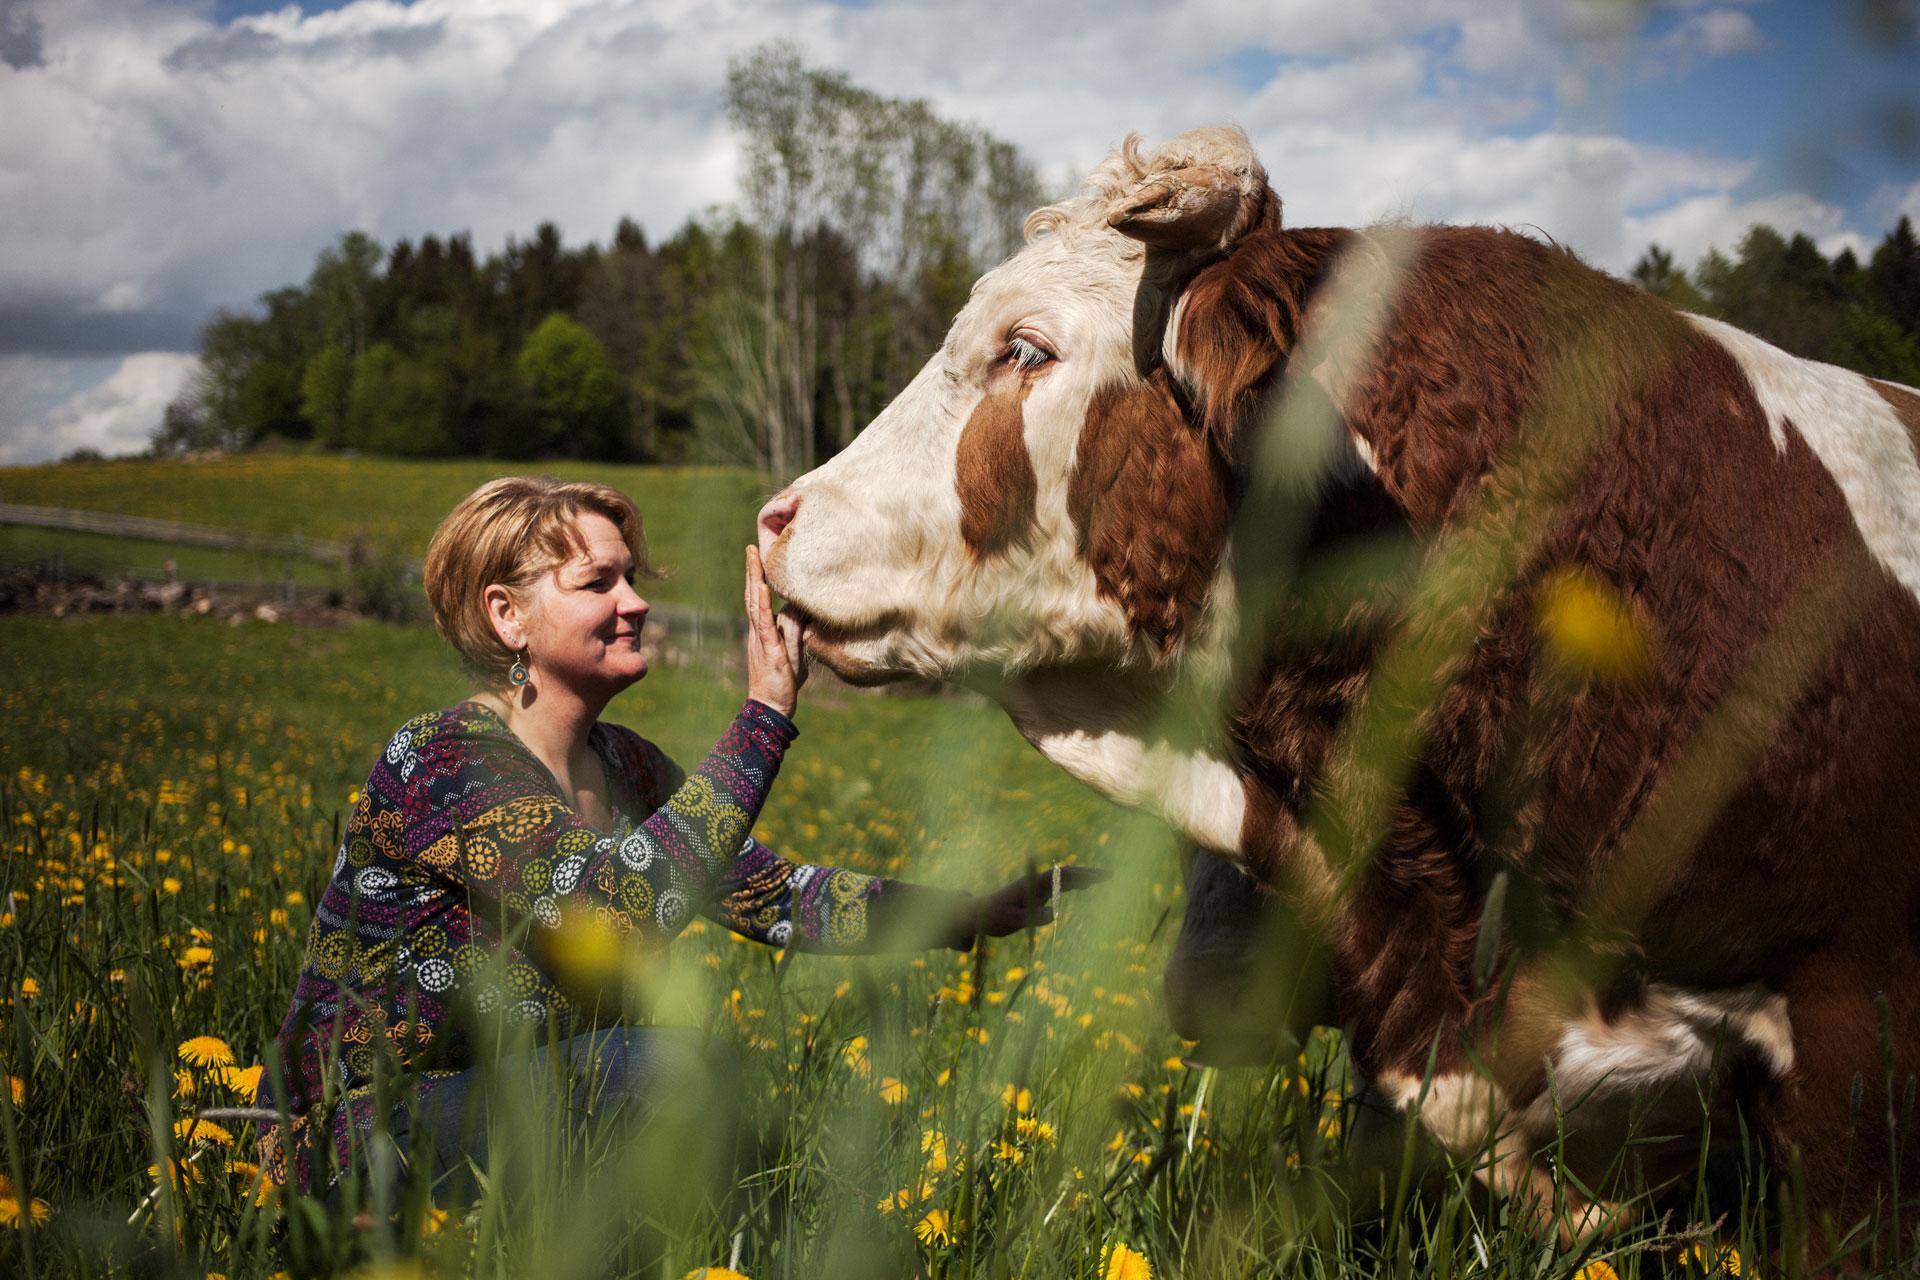 timo-stammberger-photography-fotografie-animal-rights-cow-rind-tierrechte-natur-erdlingshof-mitgefuehl-compassion